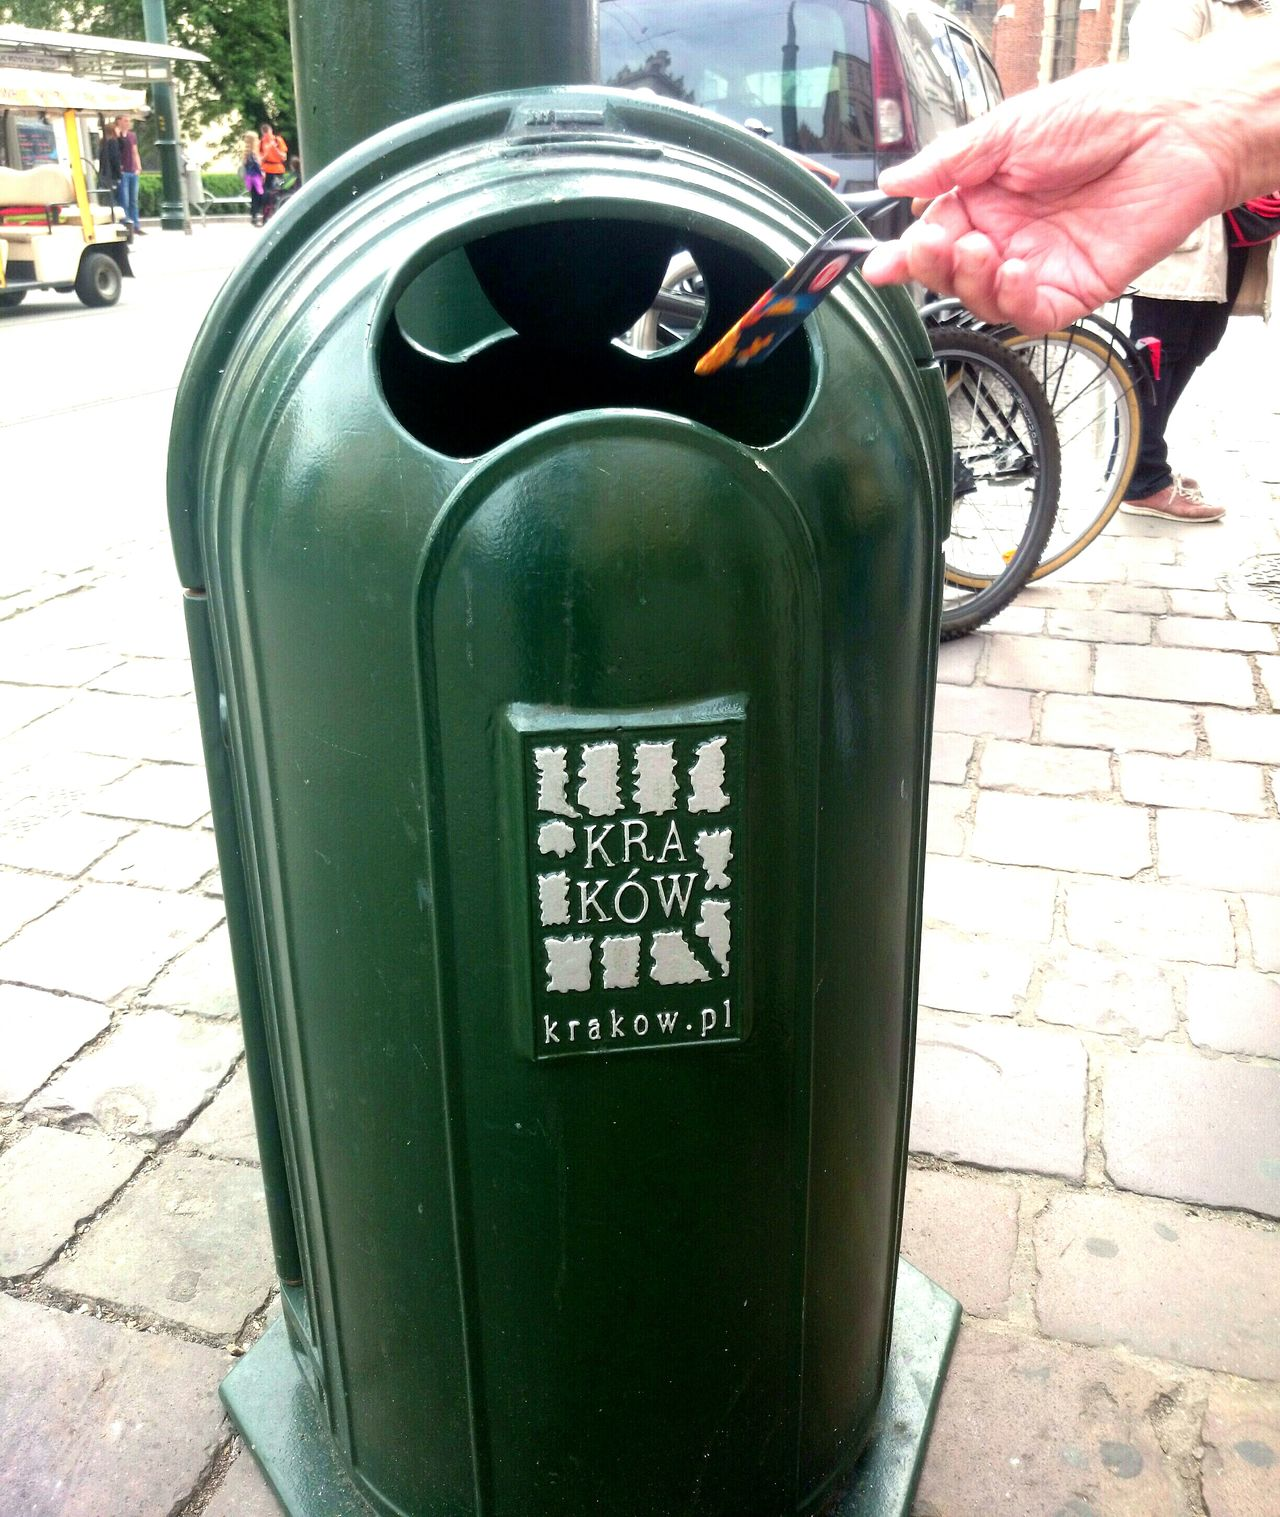 Trash bin in Cracow Kraków♥ Poland In Kraków Urban